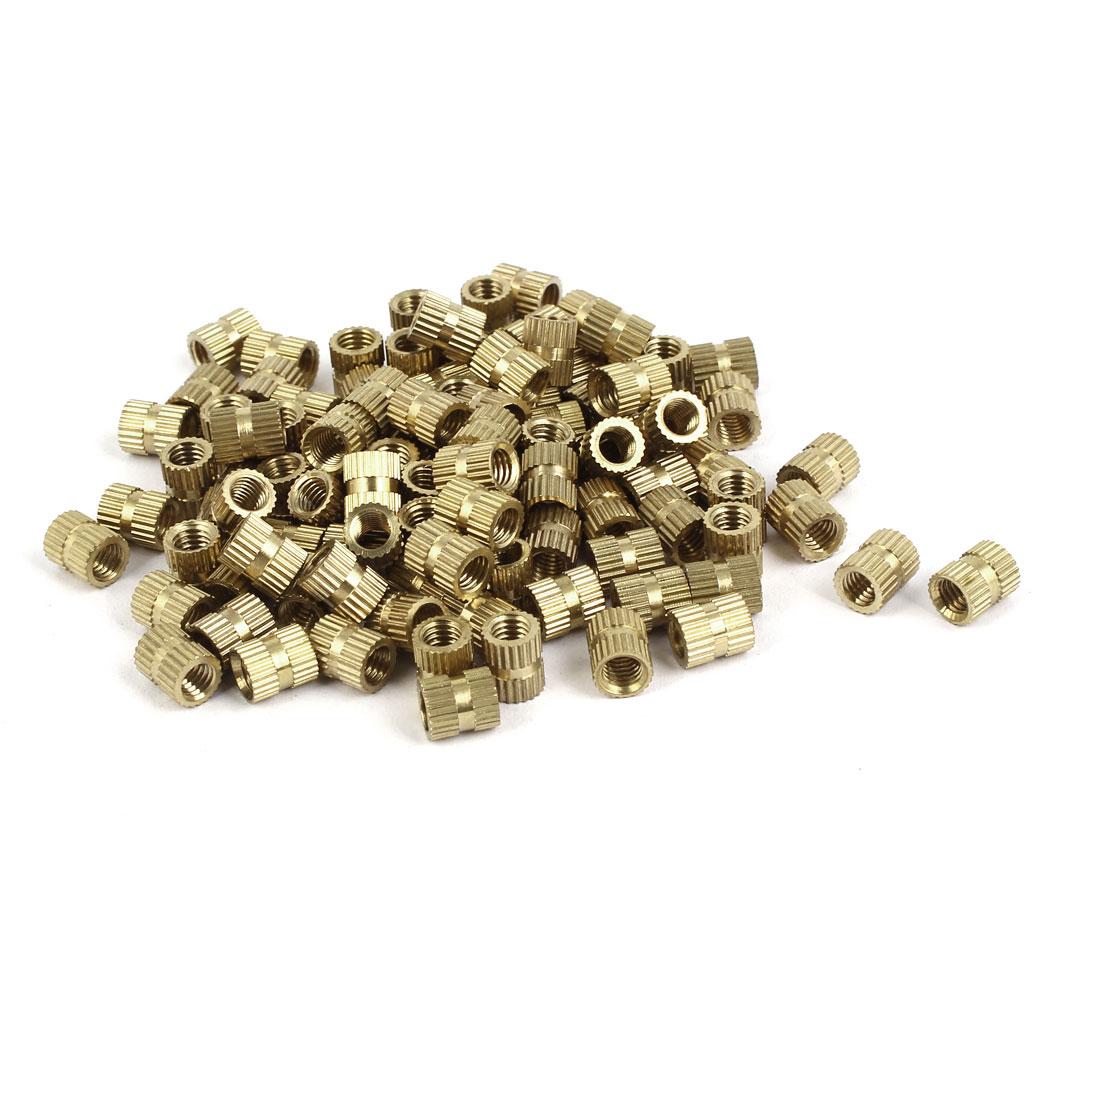 M5 x 8mm x 6.8mm Brass Injection Molding Knurled Threaded Insert Nuts 100PCS